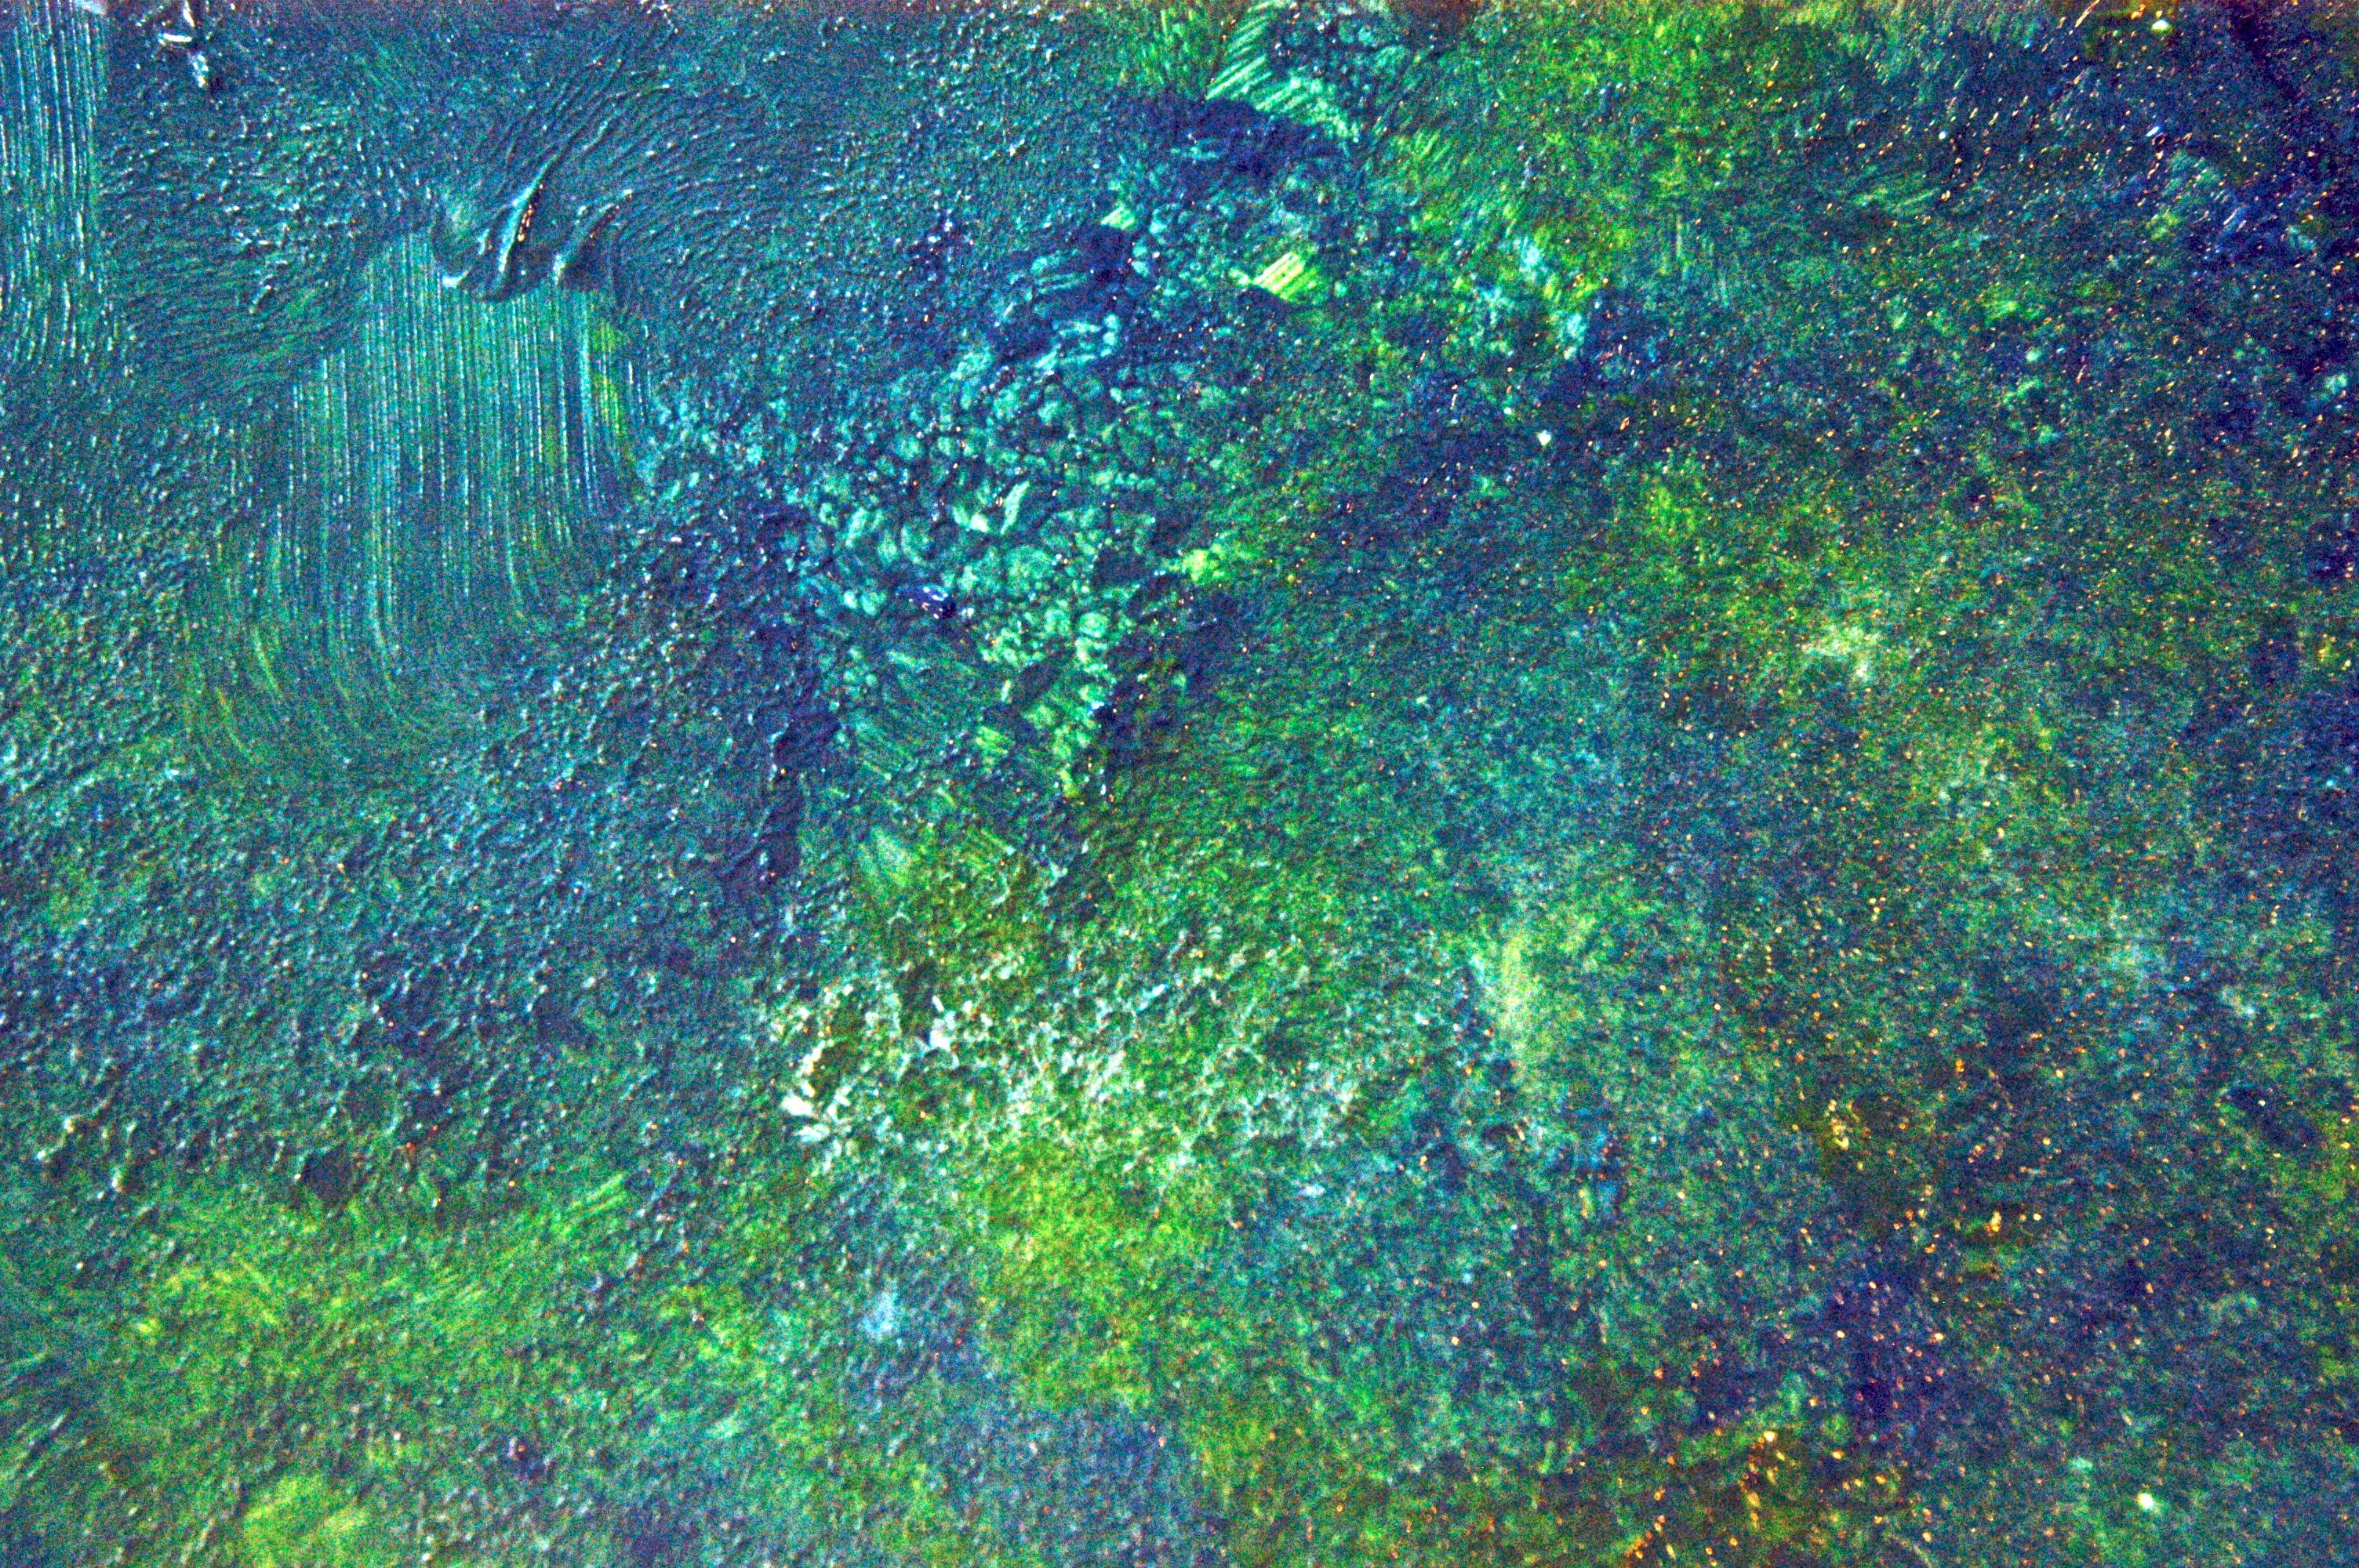 Sponged Kid Art Wet Paint Texture Flickr Photo Sharing